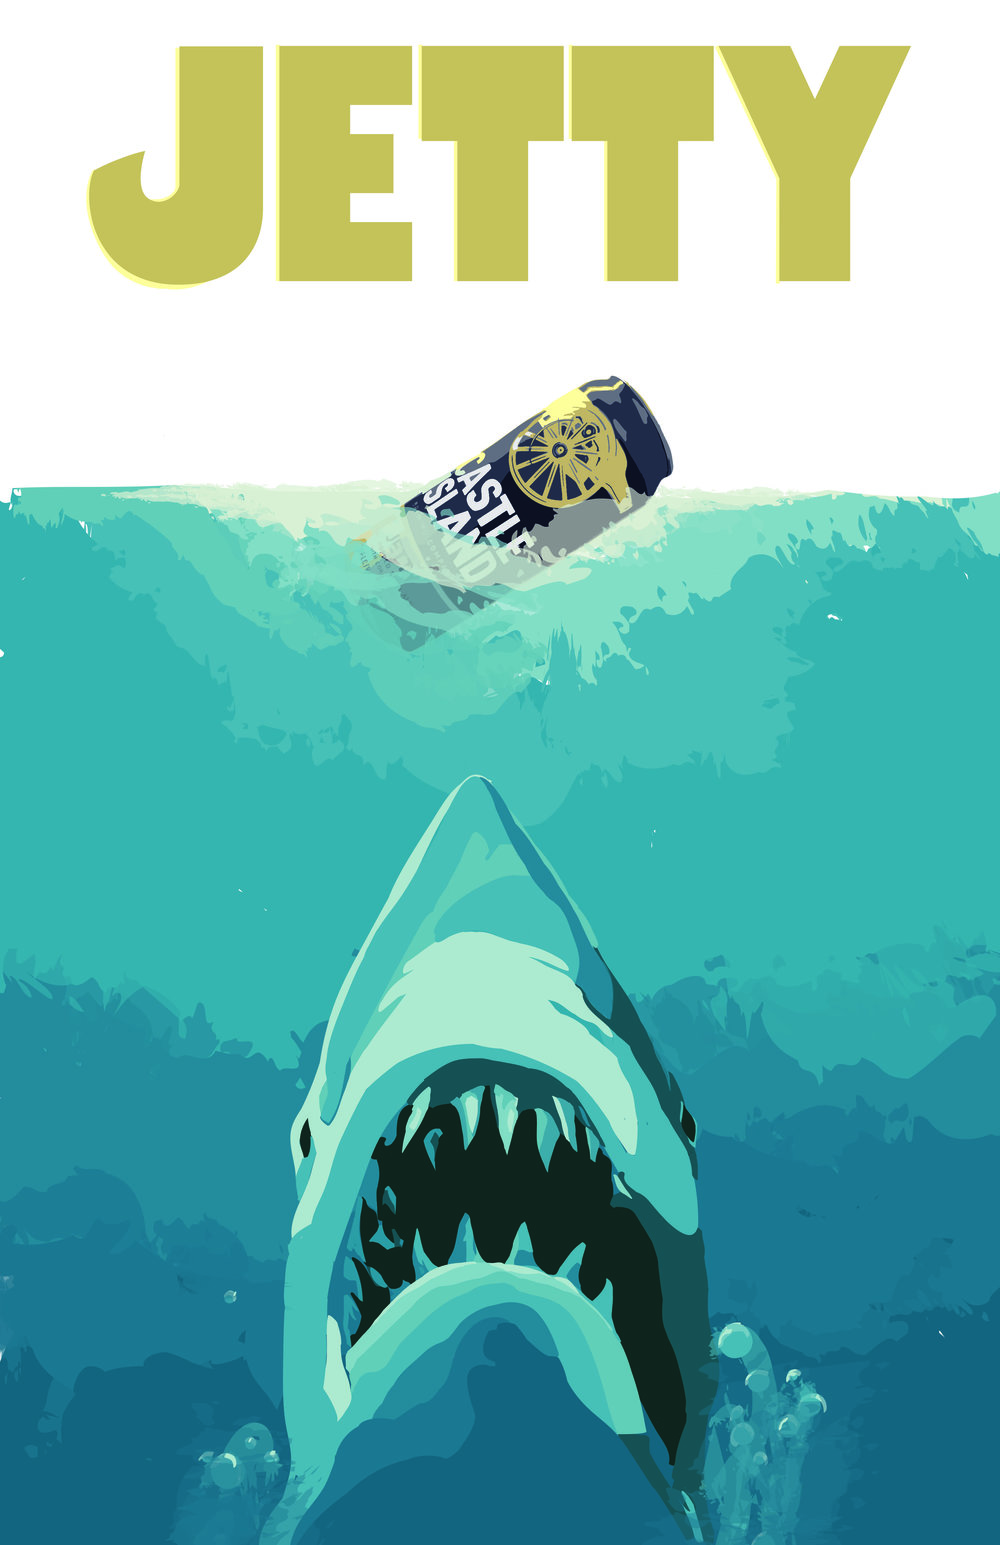 Jetty Jaws